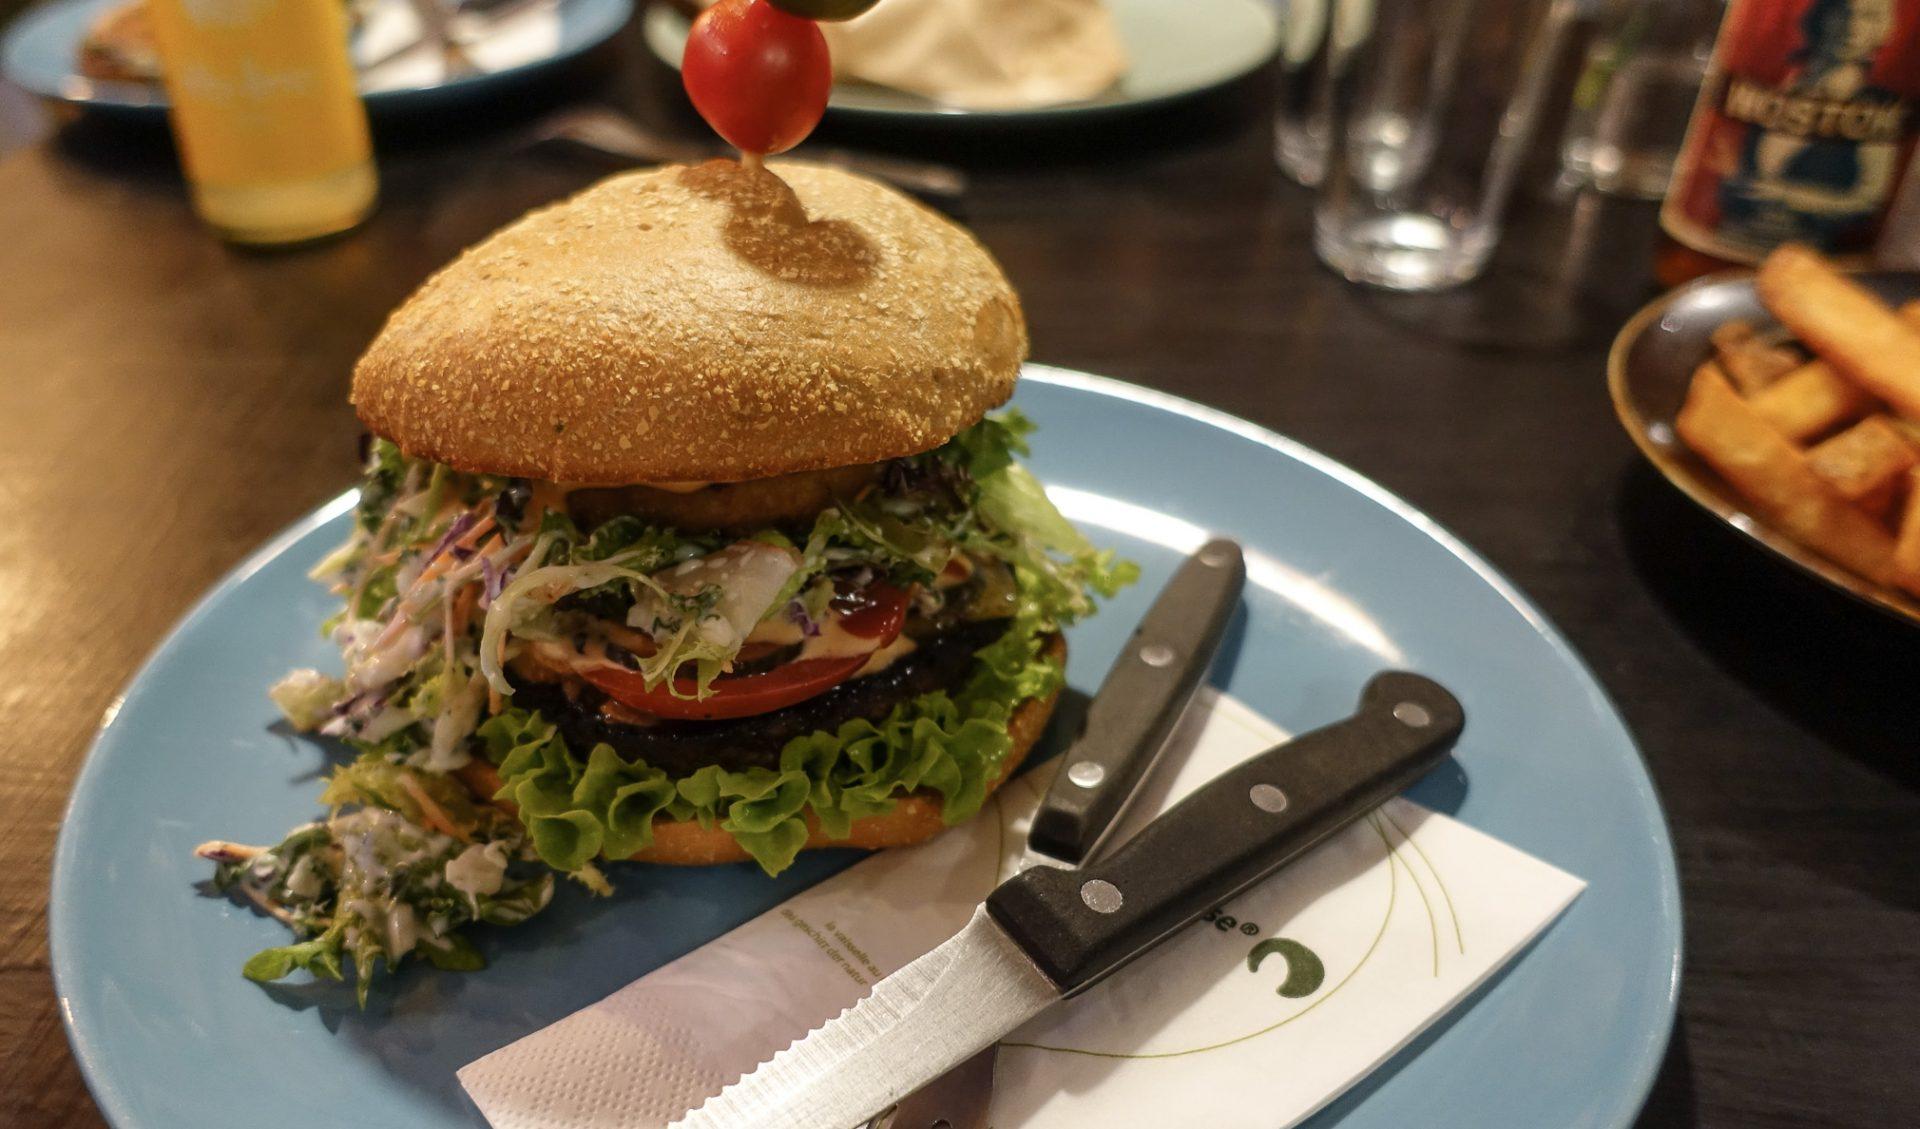 Madanmeldelse: Omtanke for mad og miljø hos veganske Café Melone